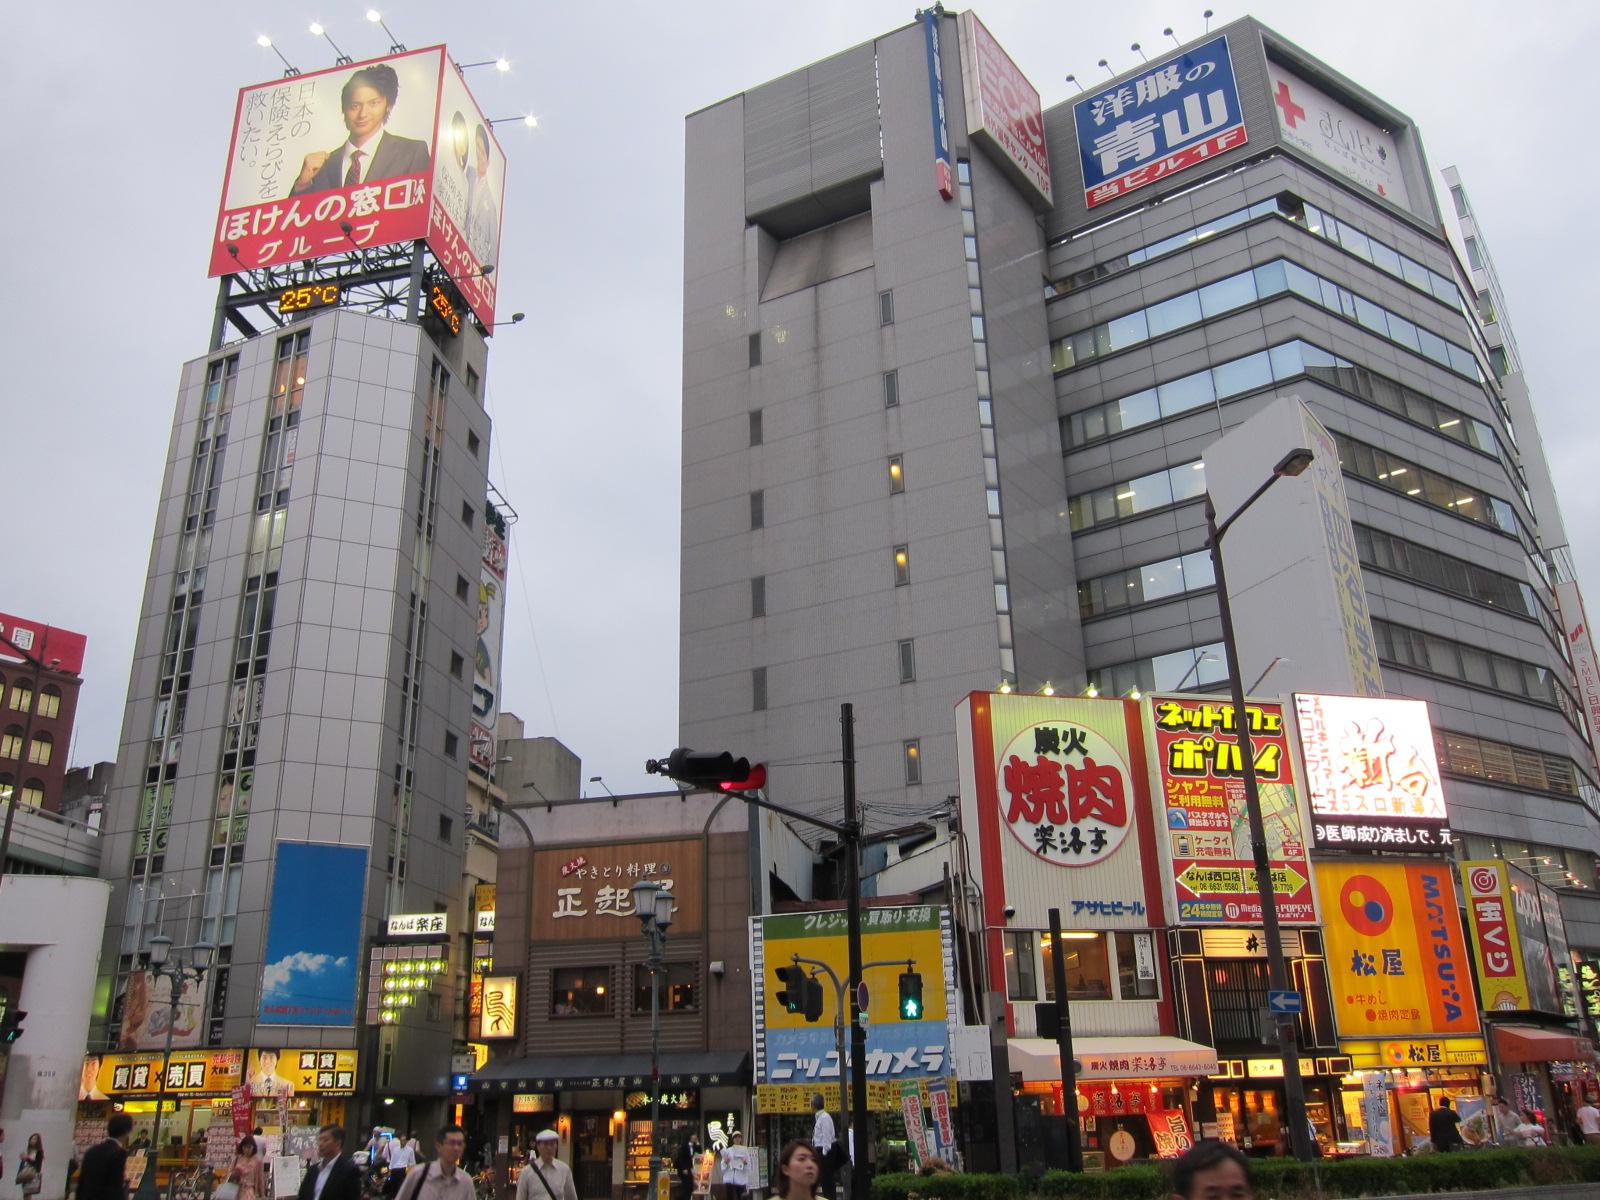 goede service loopschoenen korting OSAKA DAY 2 - OKONOMIYAKI AT MIZUNO DOTONBORI AND SHINSEKAI ...